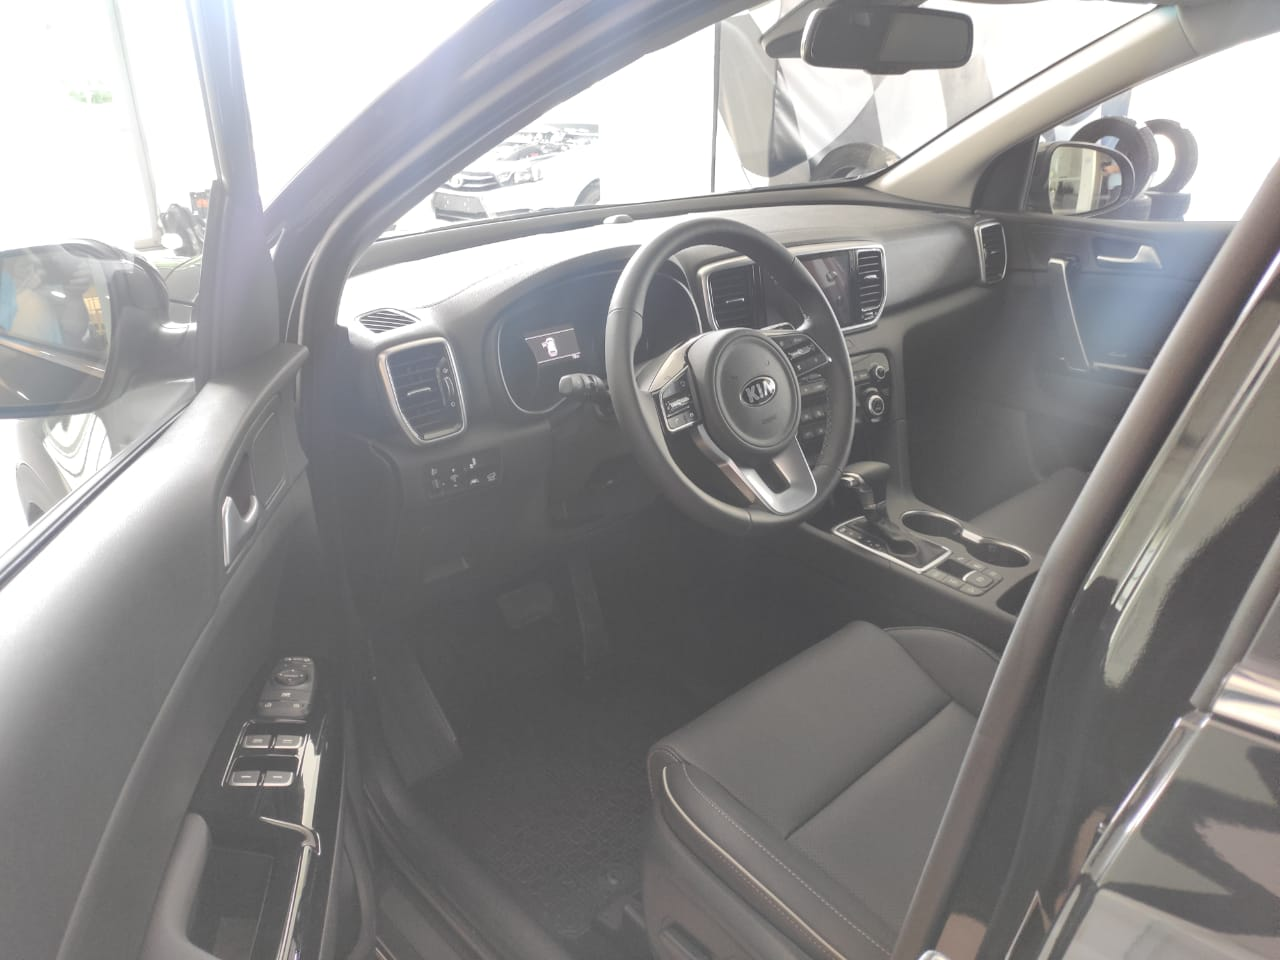 Kia Sportage 2.4 GDI., 184 л.c., бензин., Автомат 6AT., Полный 4WD., Premium Black Edition., 2021